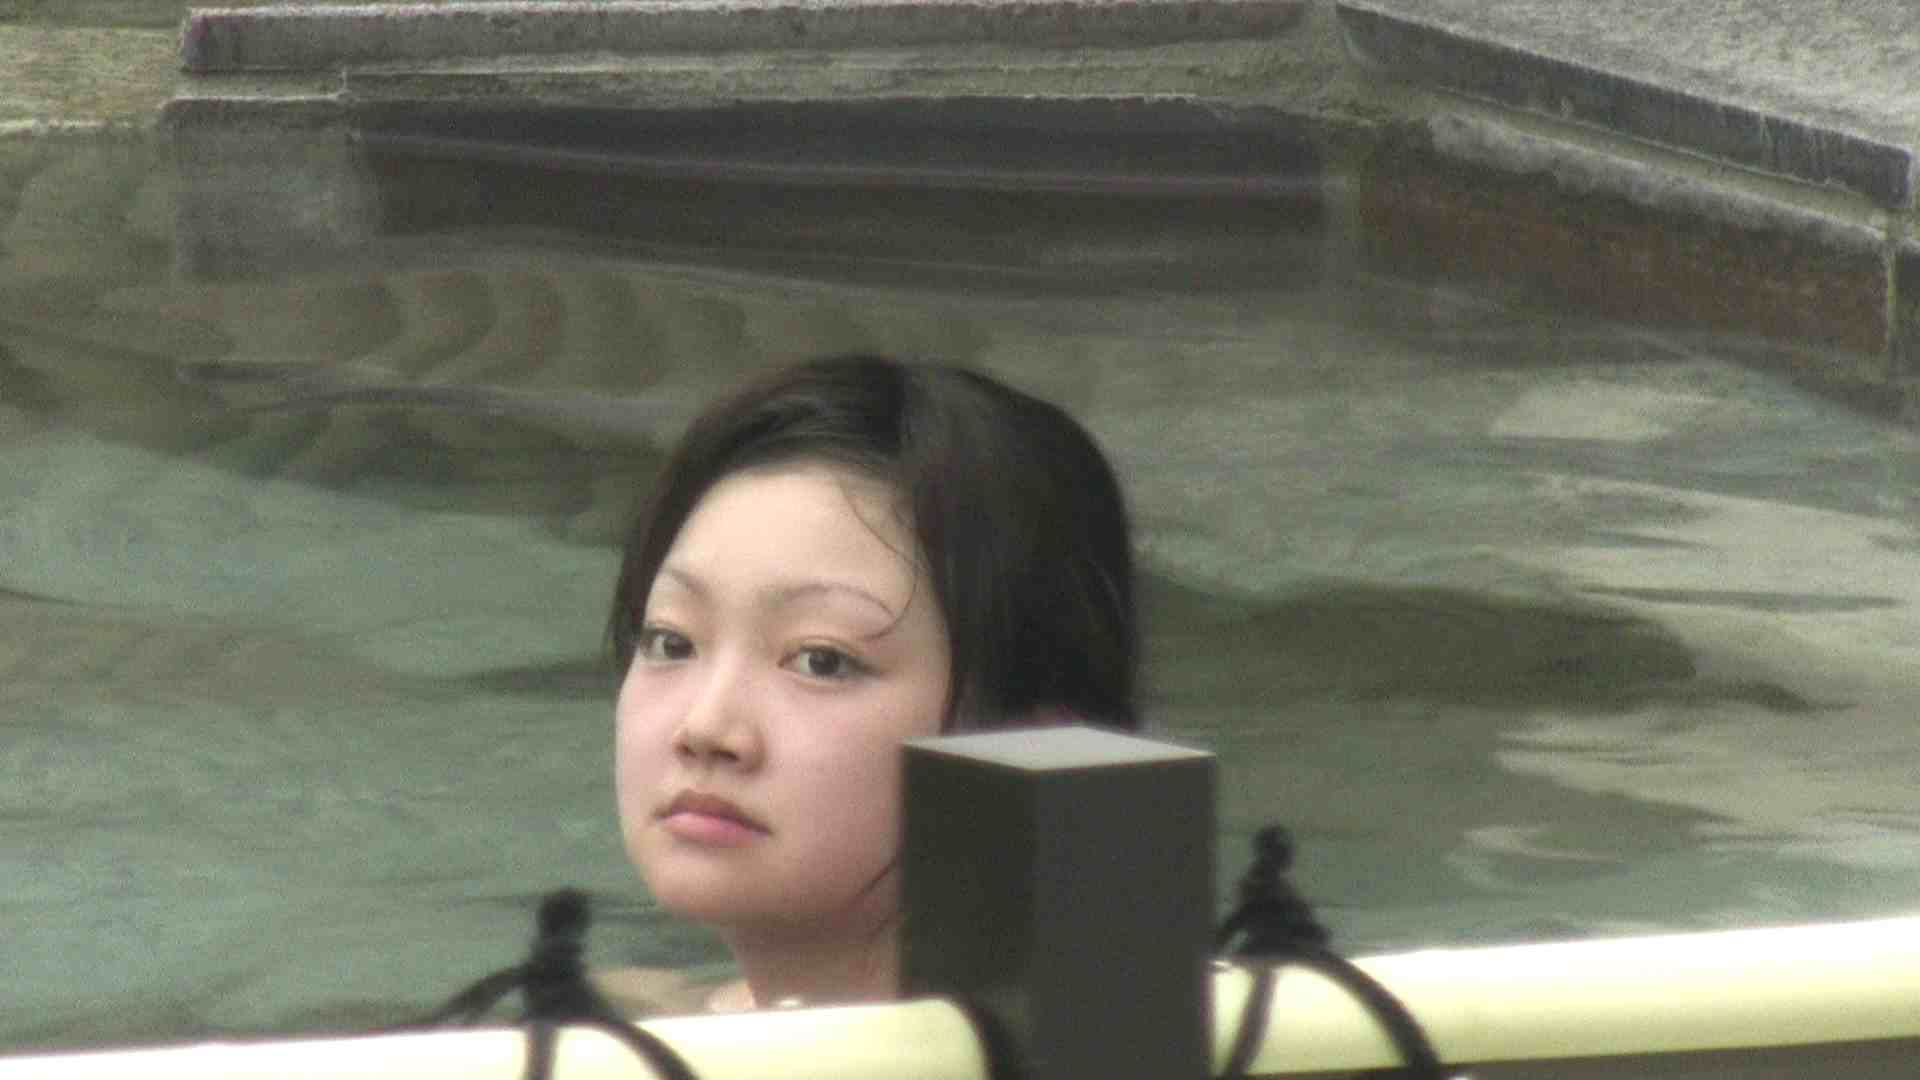 Aquaな露天風呂Vol.126 盗撮シリーズ   露天風呂編  103PIX 3